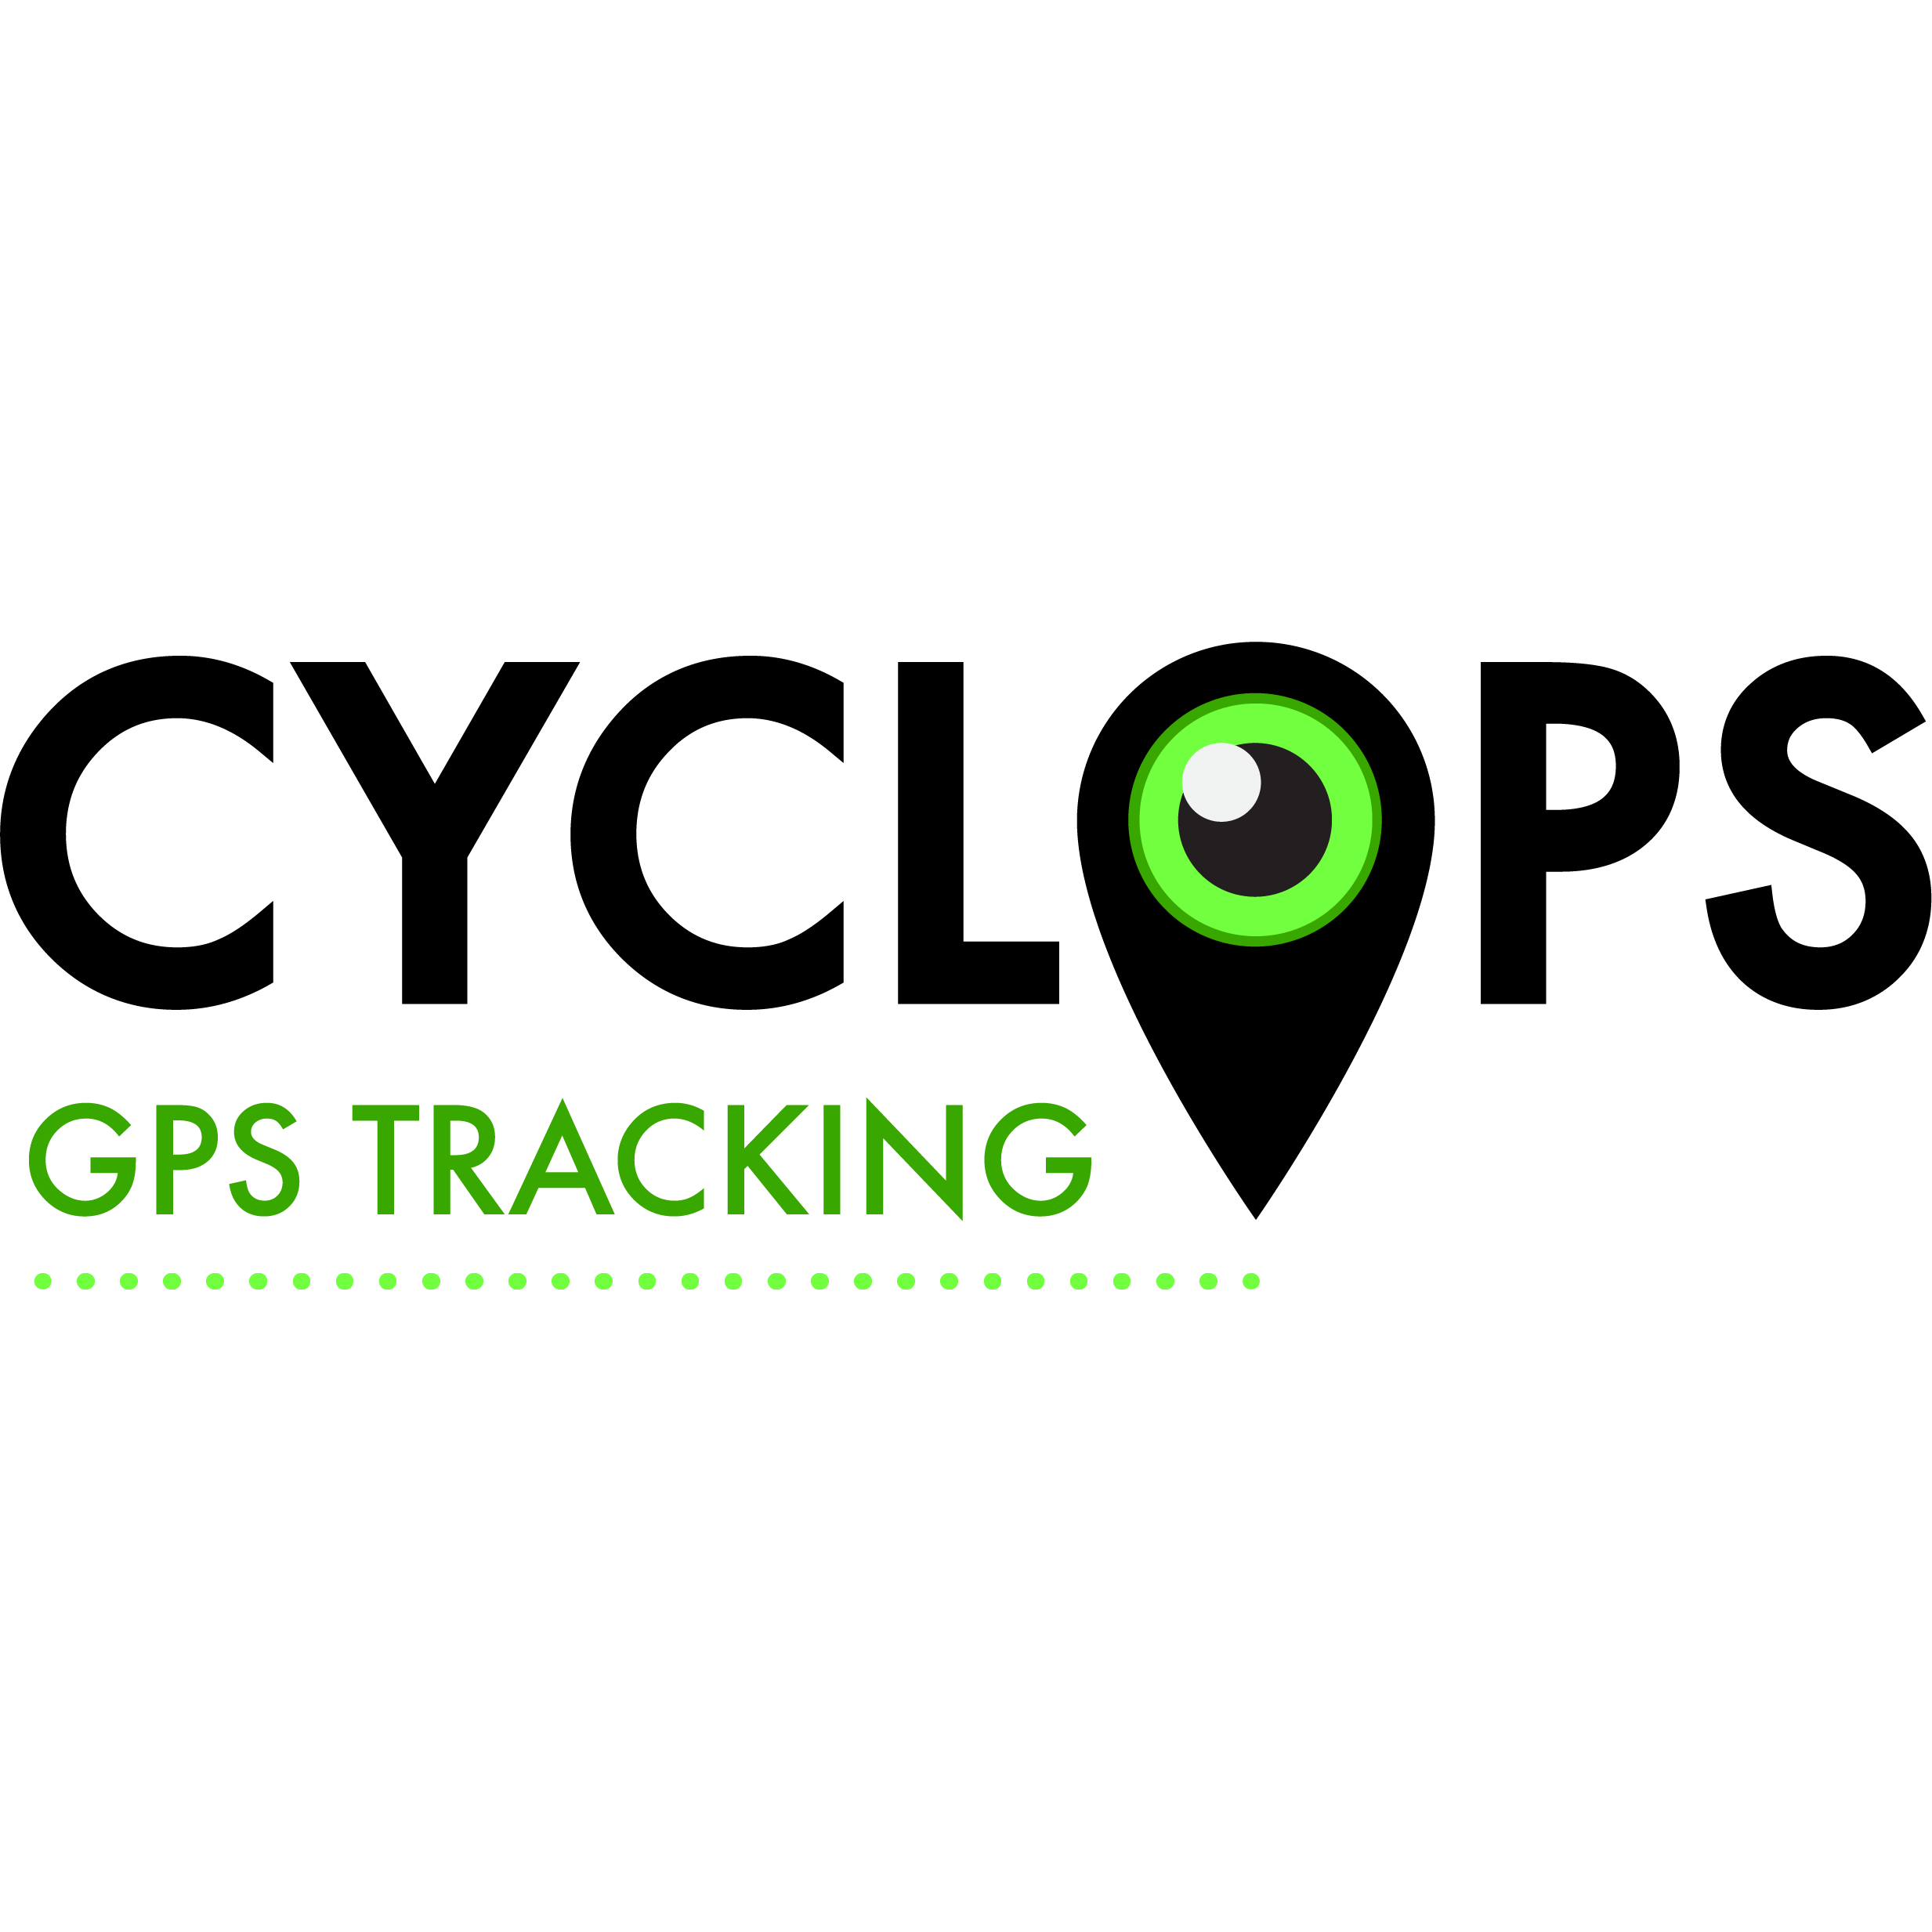 Cyclops GPS